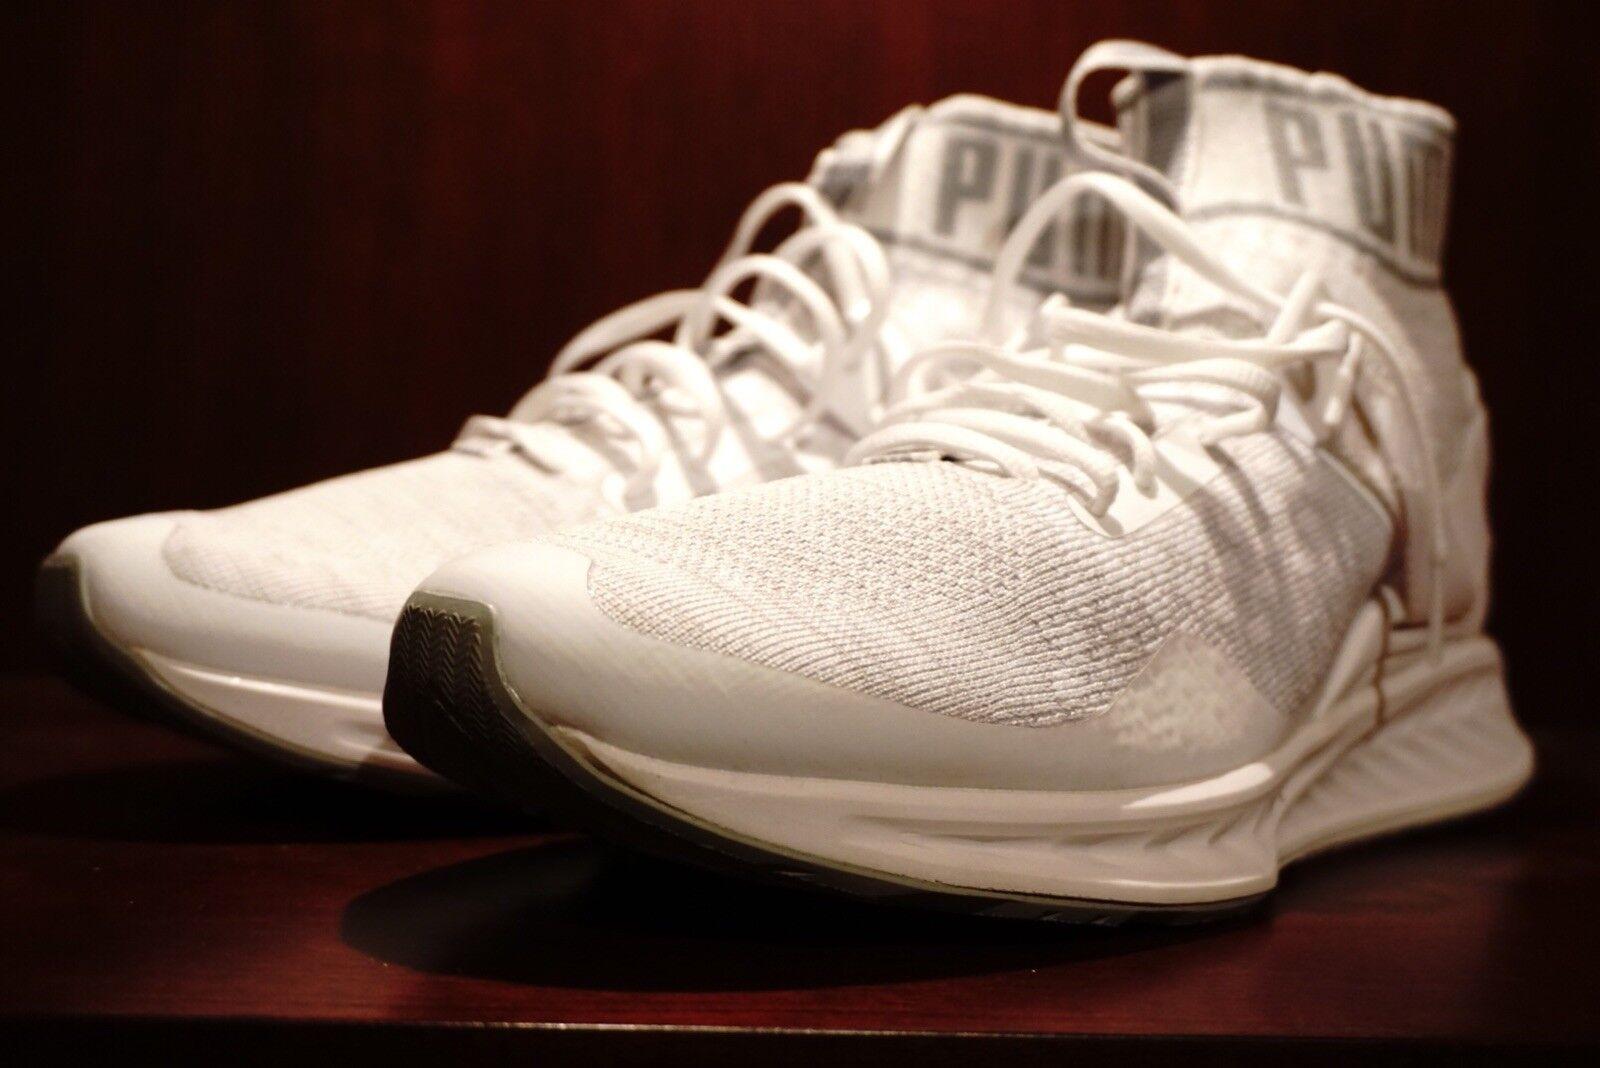 Puma IGNITE EVOKNIT White - Mens. Comfortable Wild casual shoes